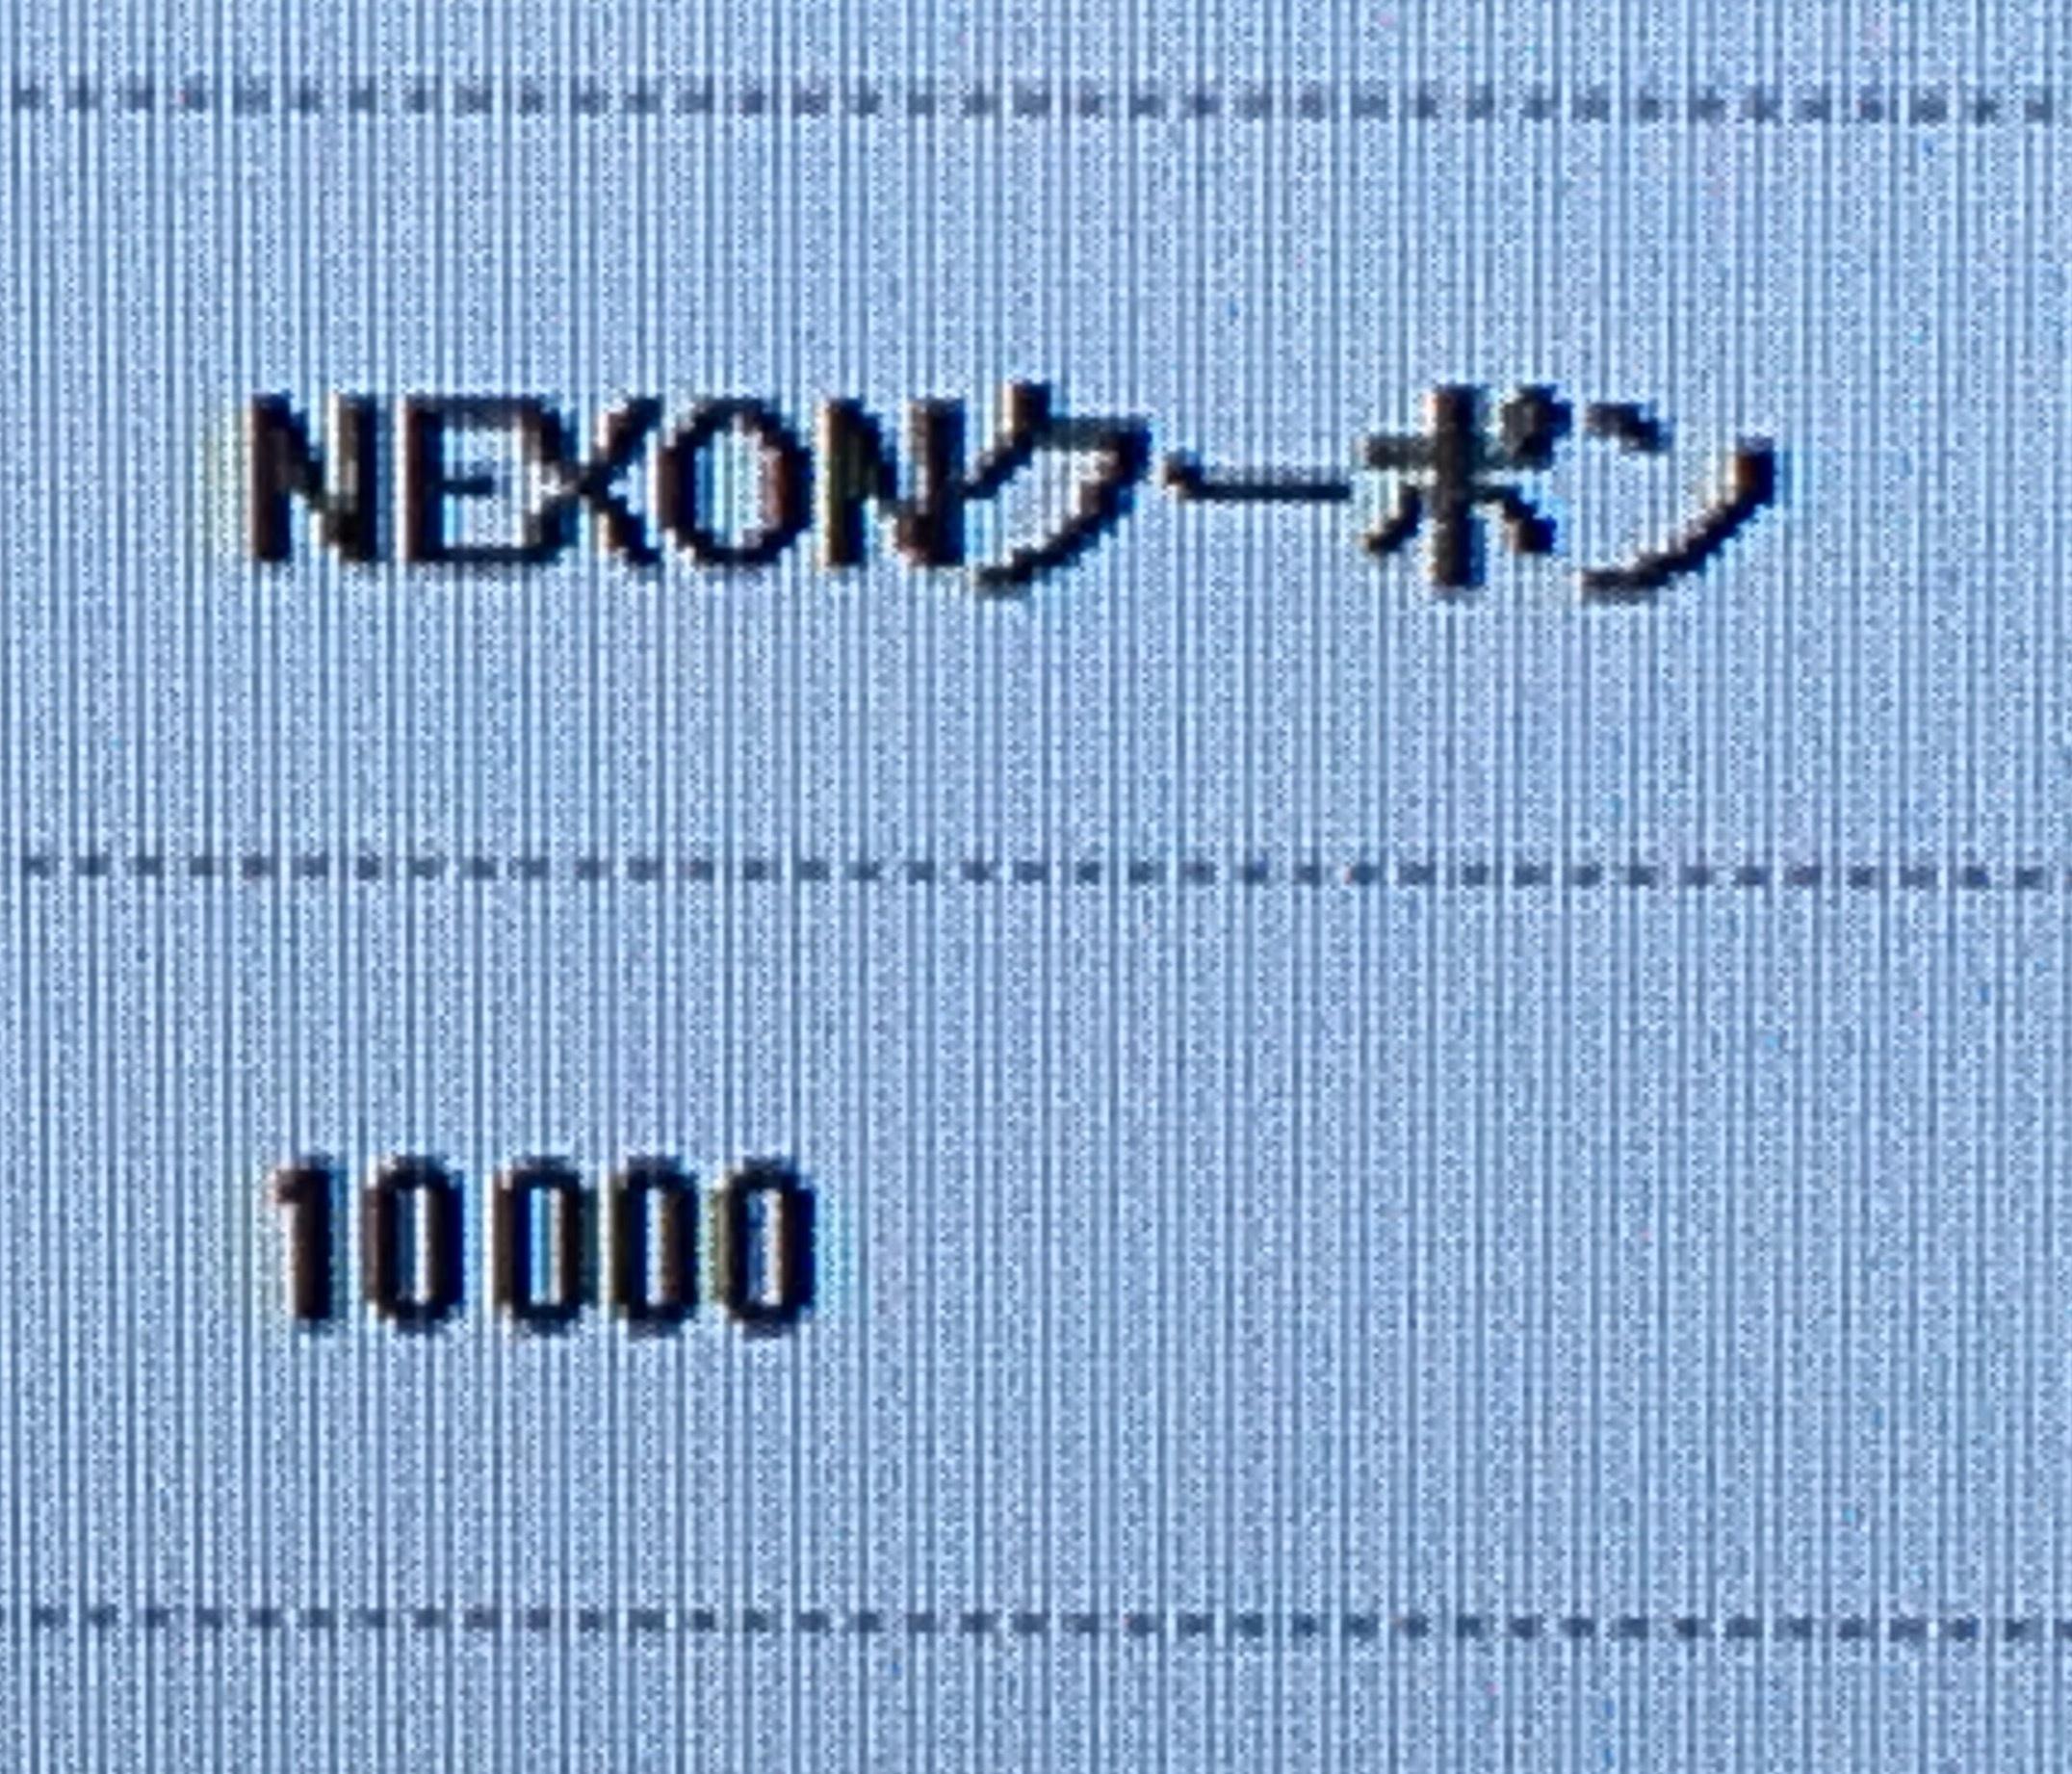 20170103095006a79.jpg